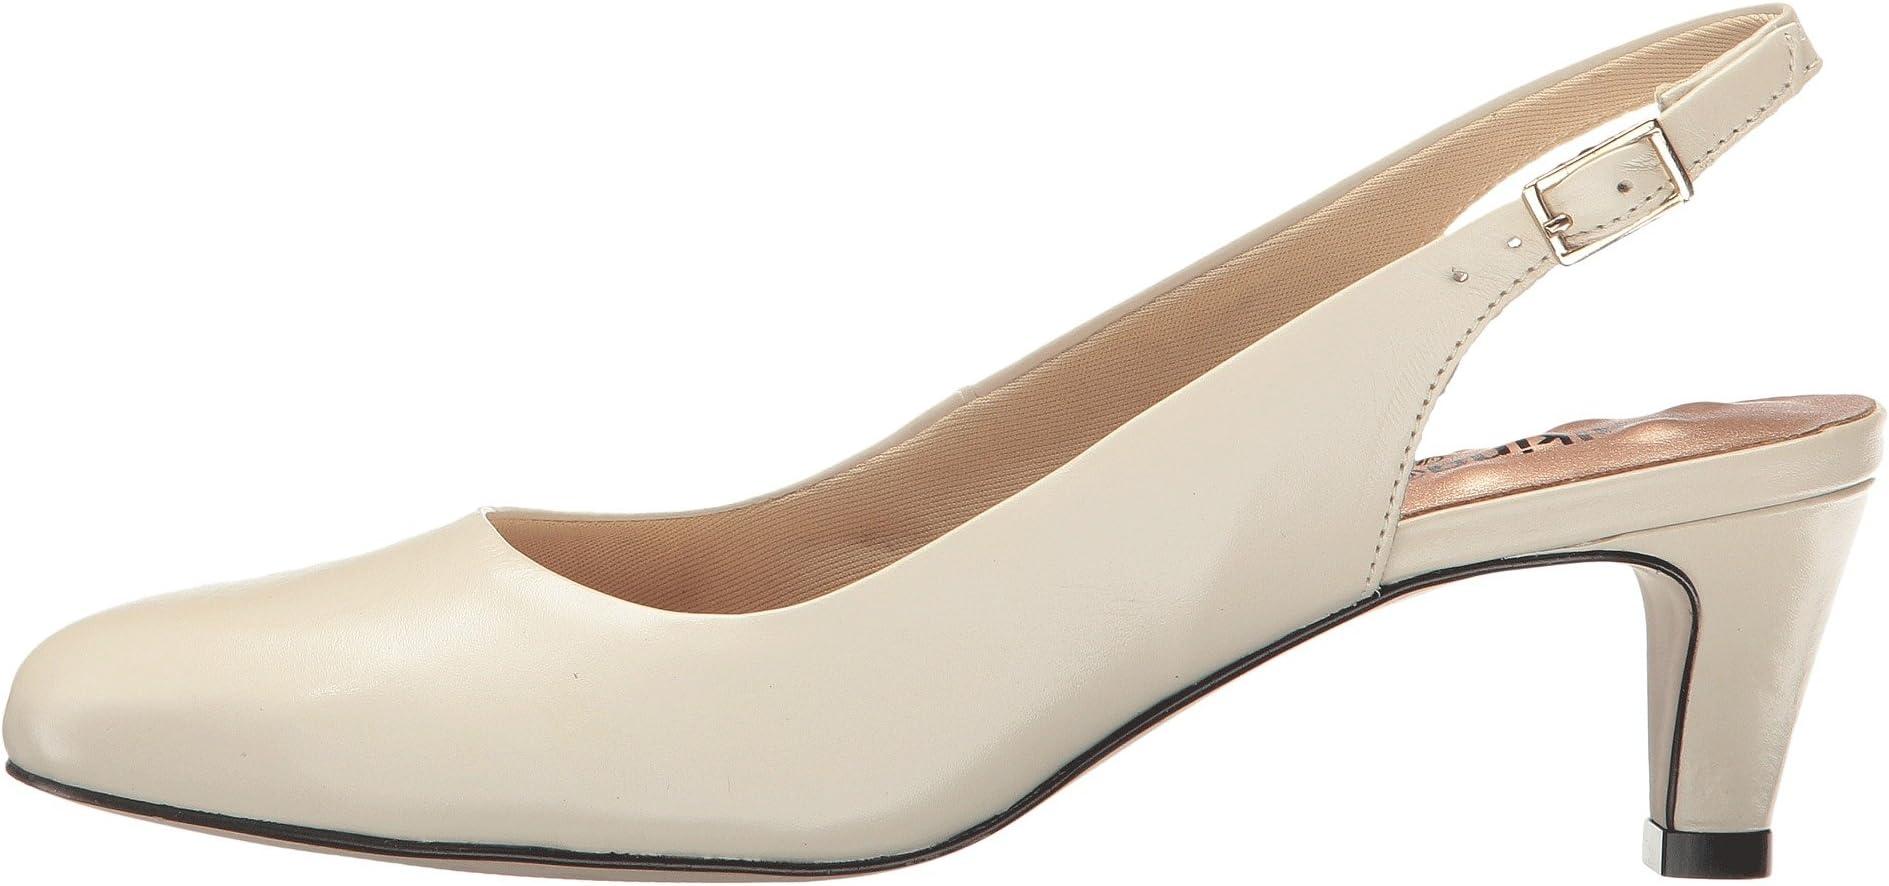 Walking Cradles Jolly   Women's shoes   2020 Newest